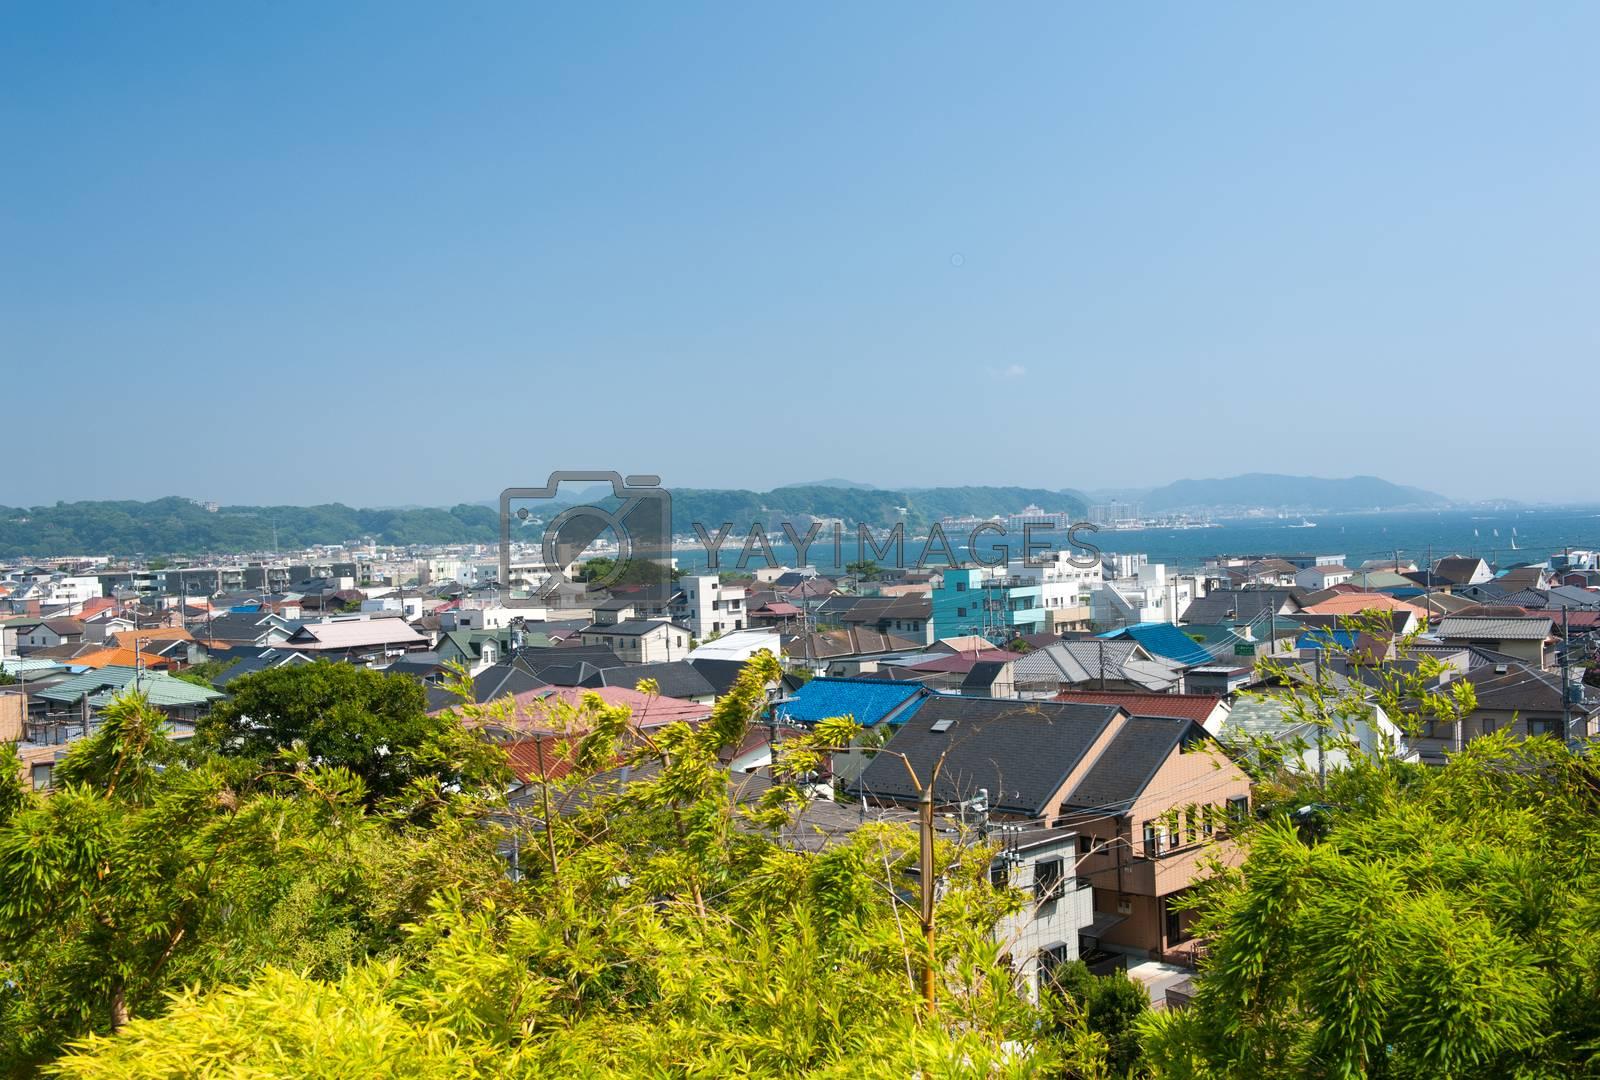 Beach at Kamakura by fyletto